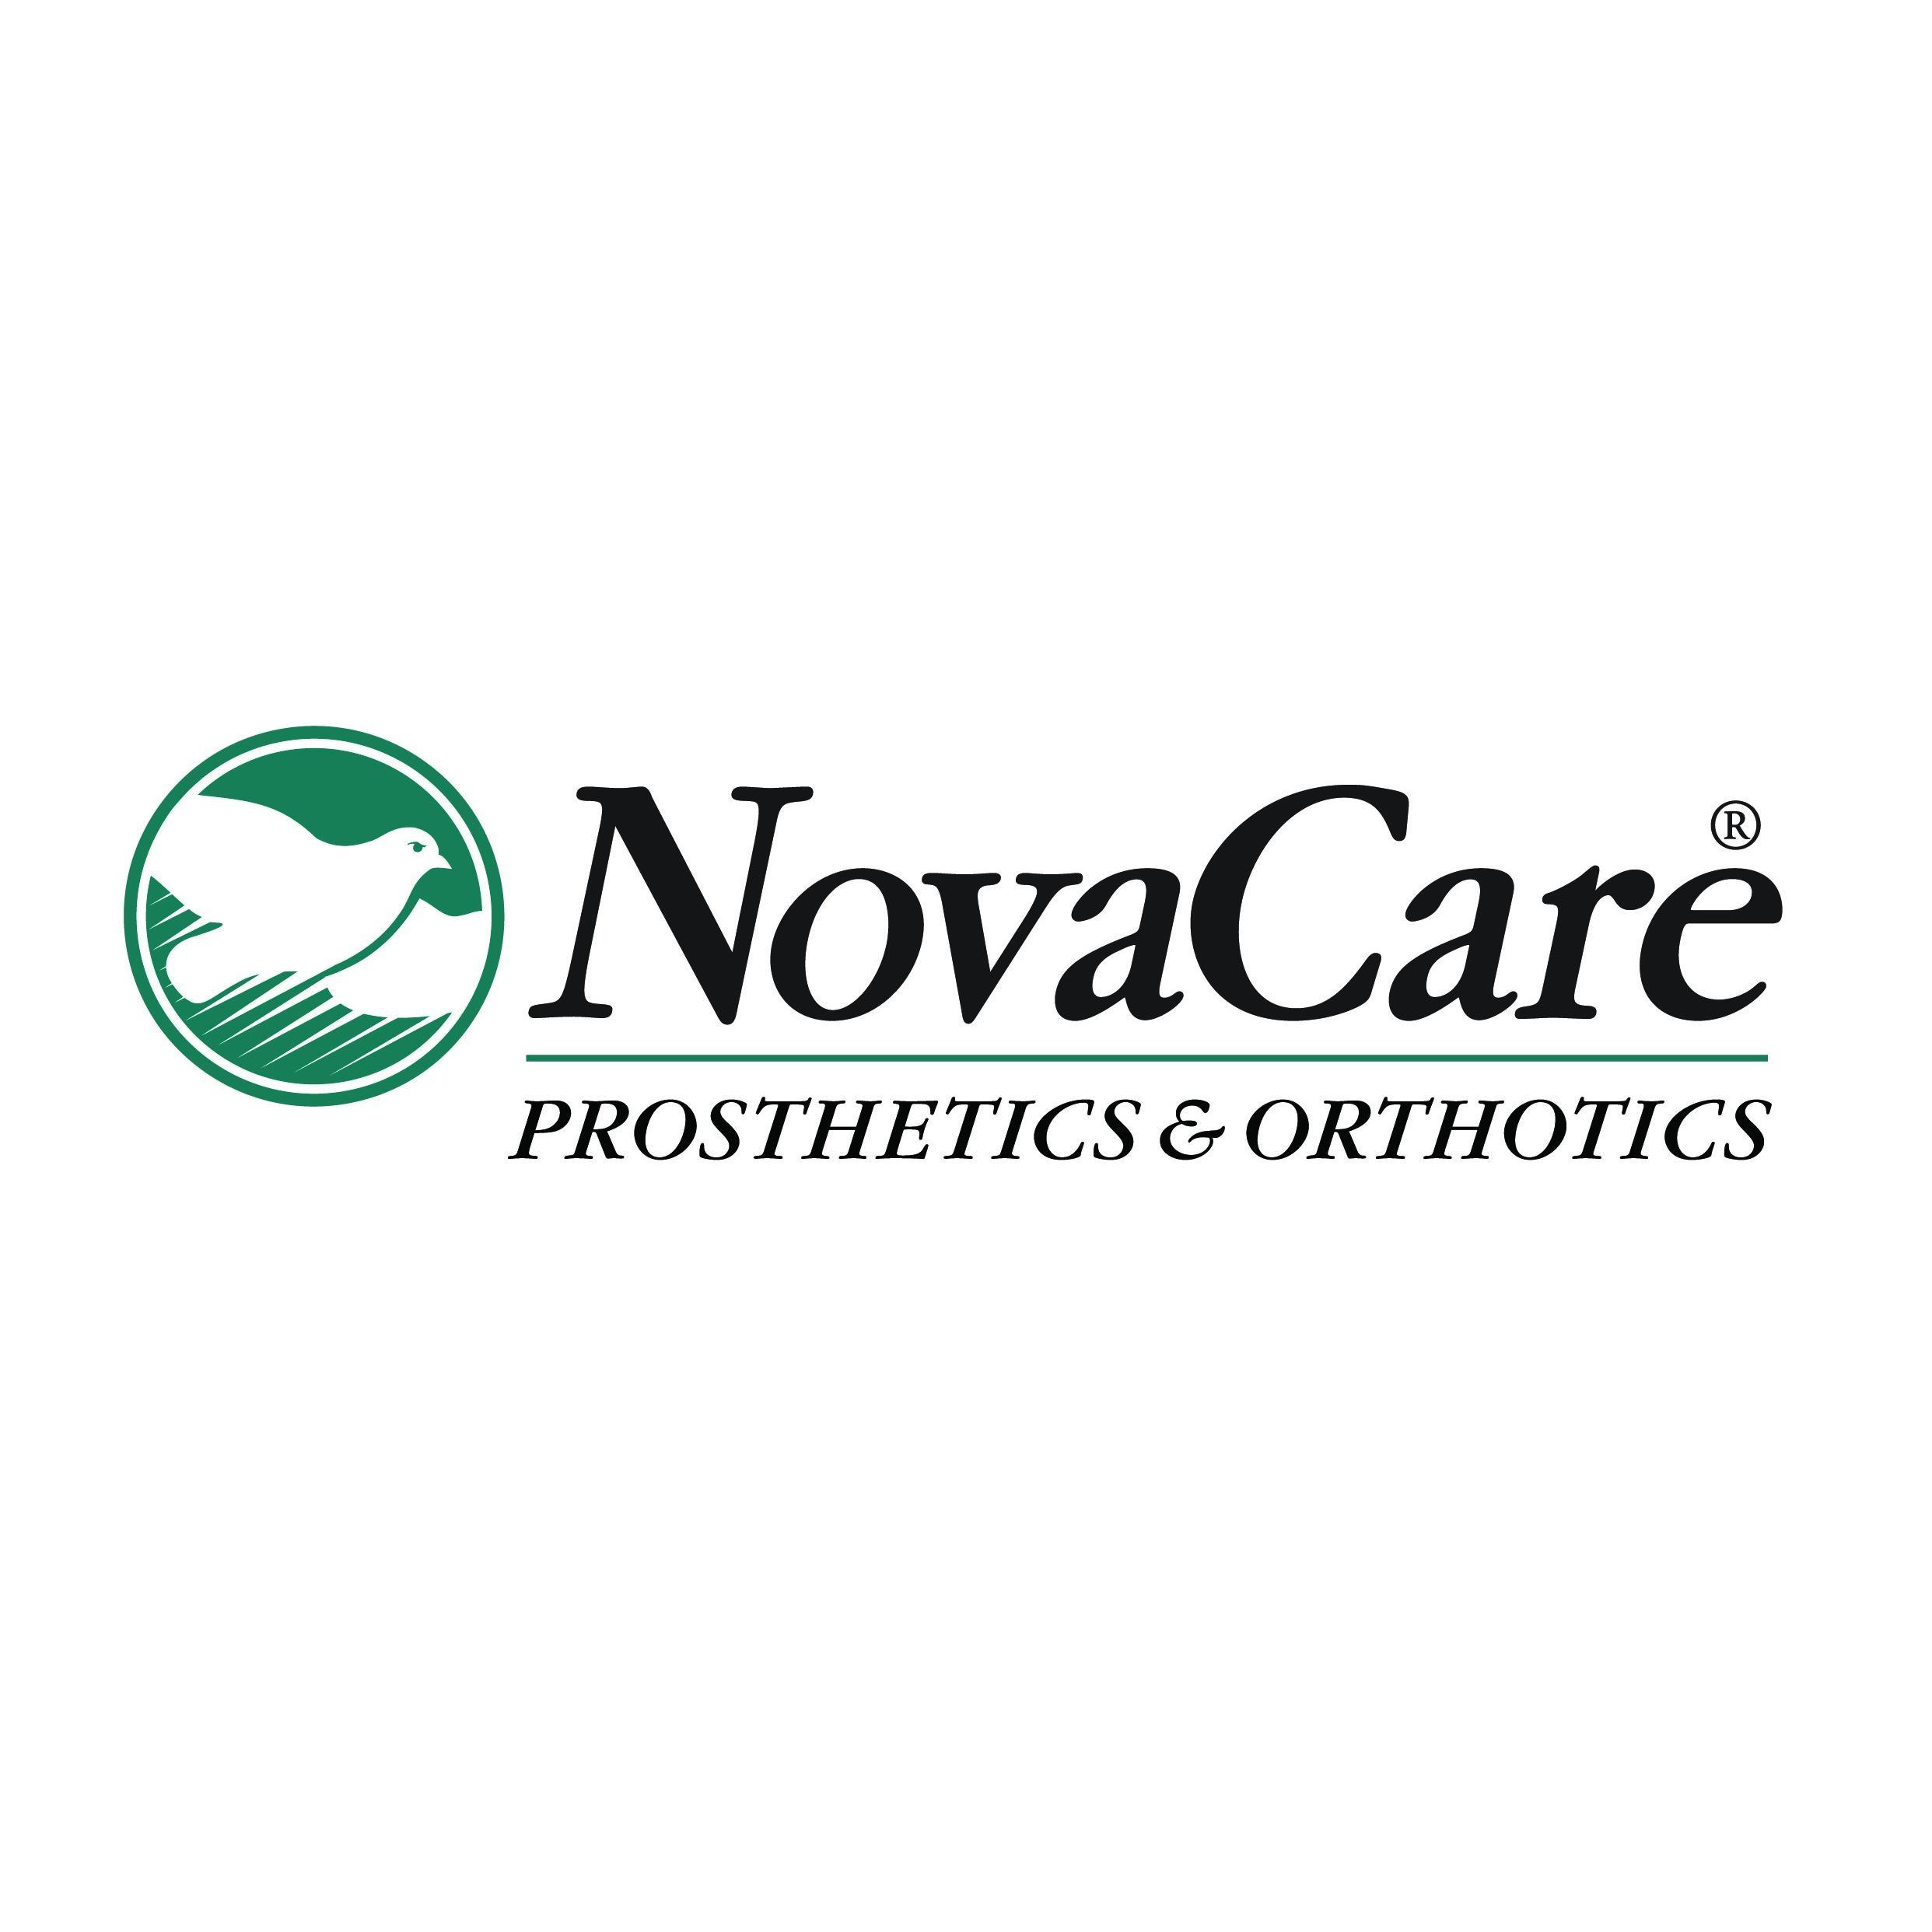 Novacare Prosthetics & Orthotics